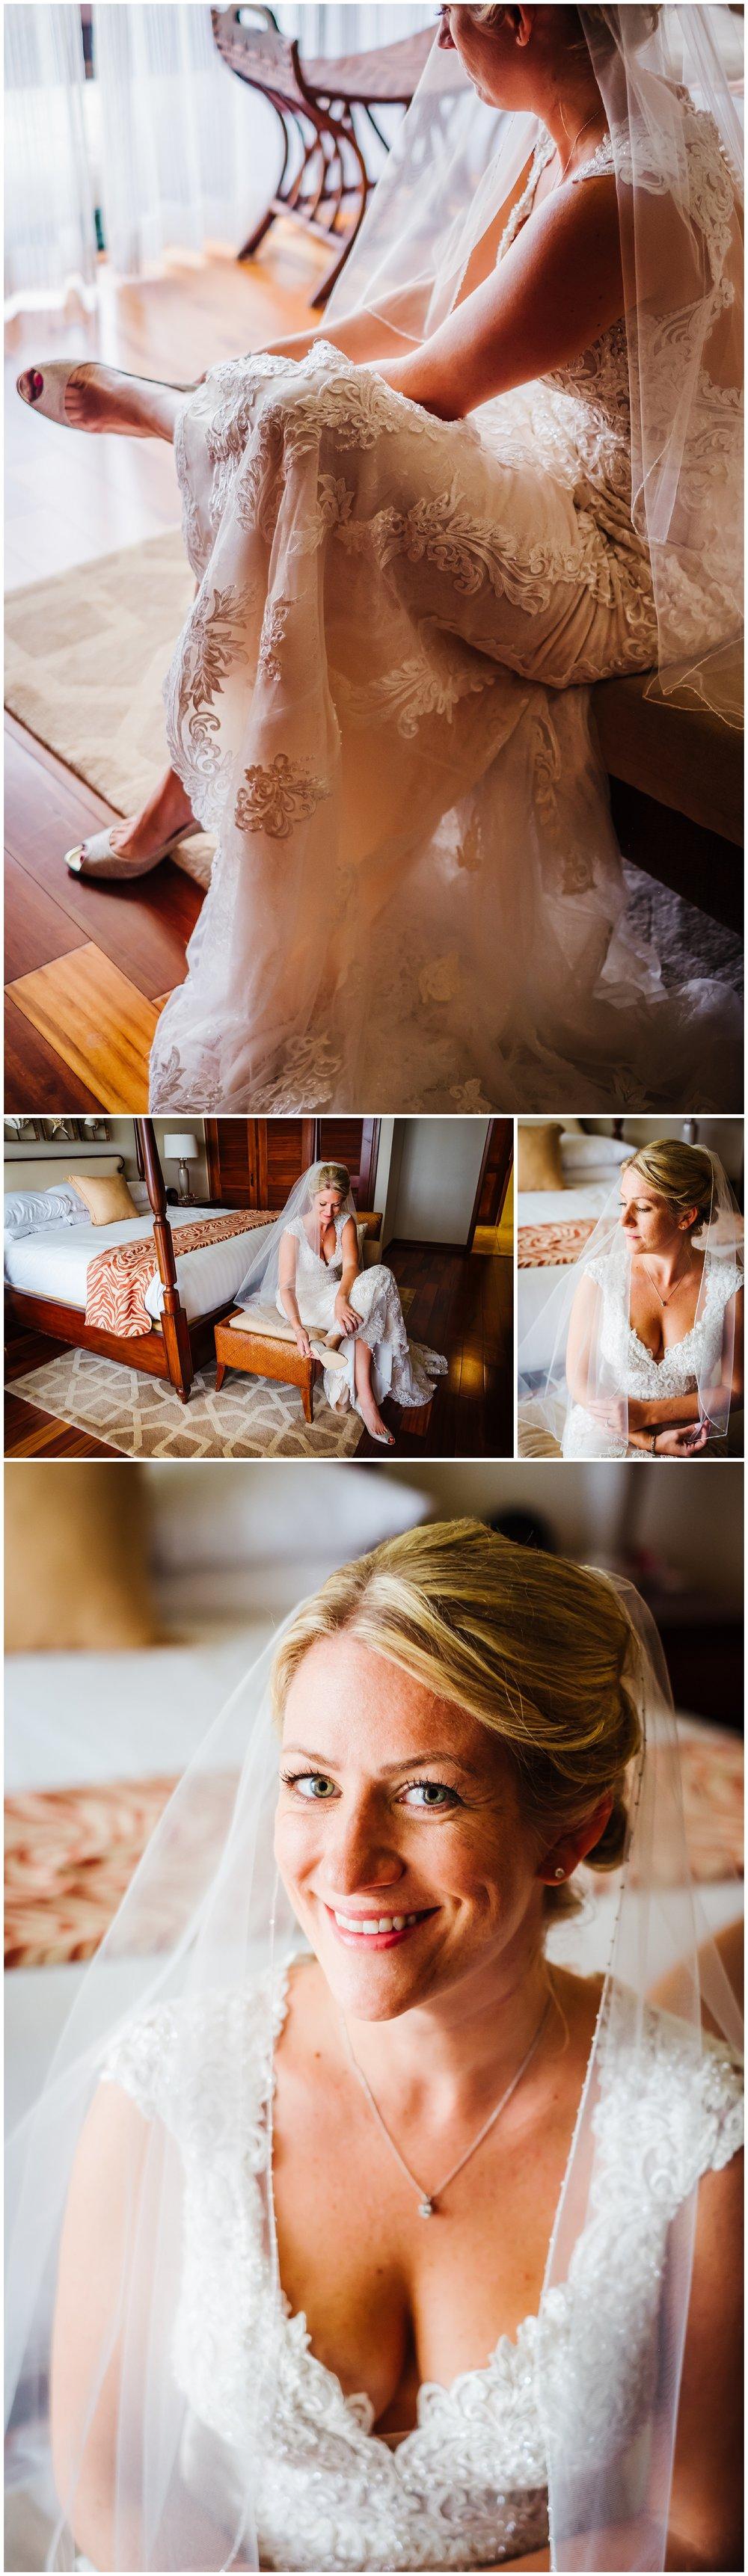 destination-wedding-hawaii-kauai-grand-hyatt-resort-napali-coast-sail_0051.jpg